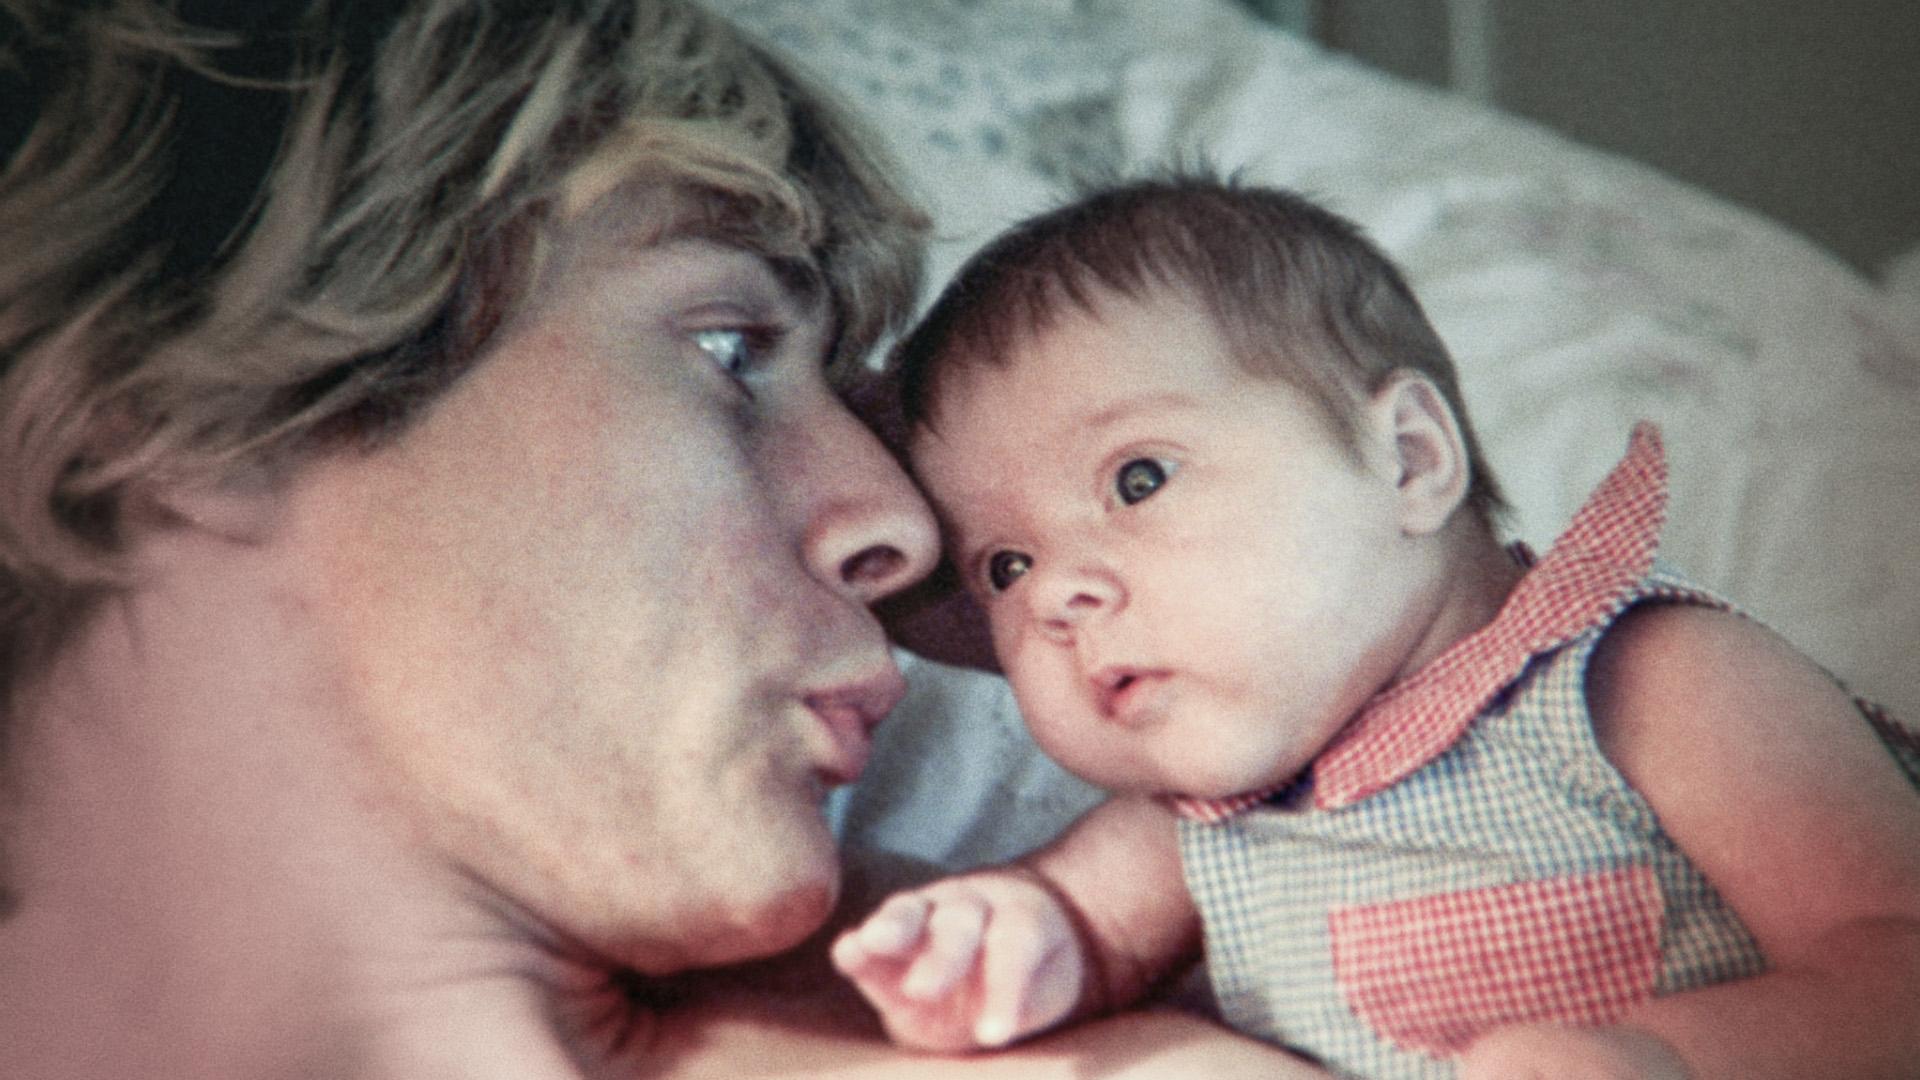 Cobain with Frances Bean.